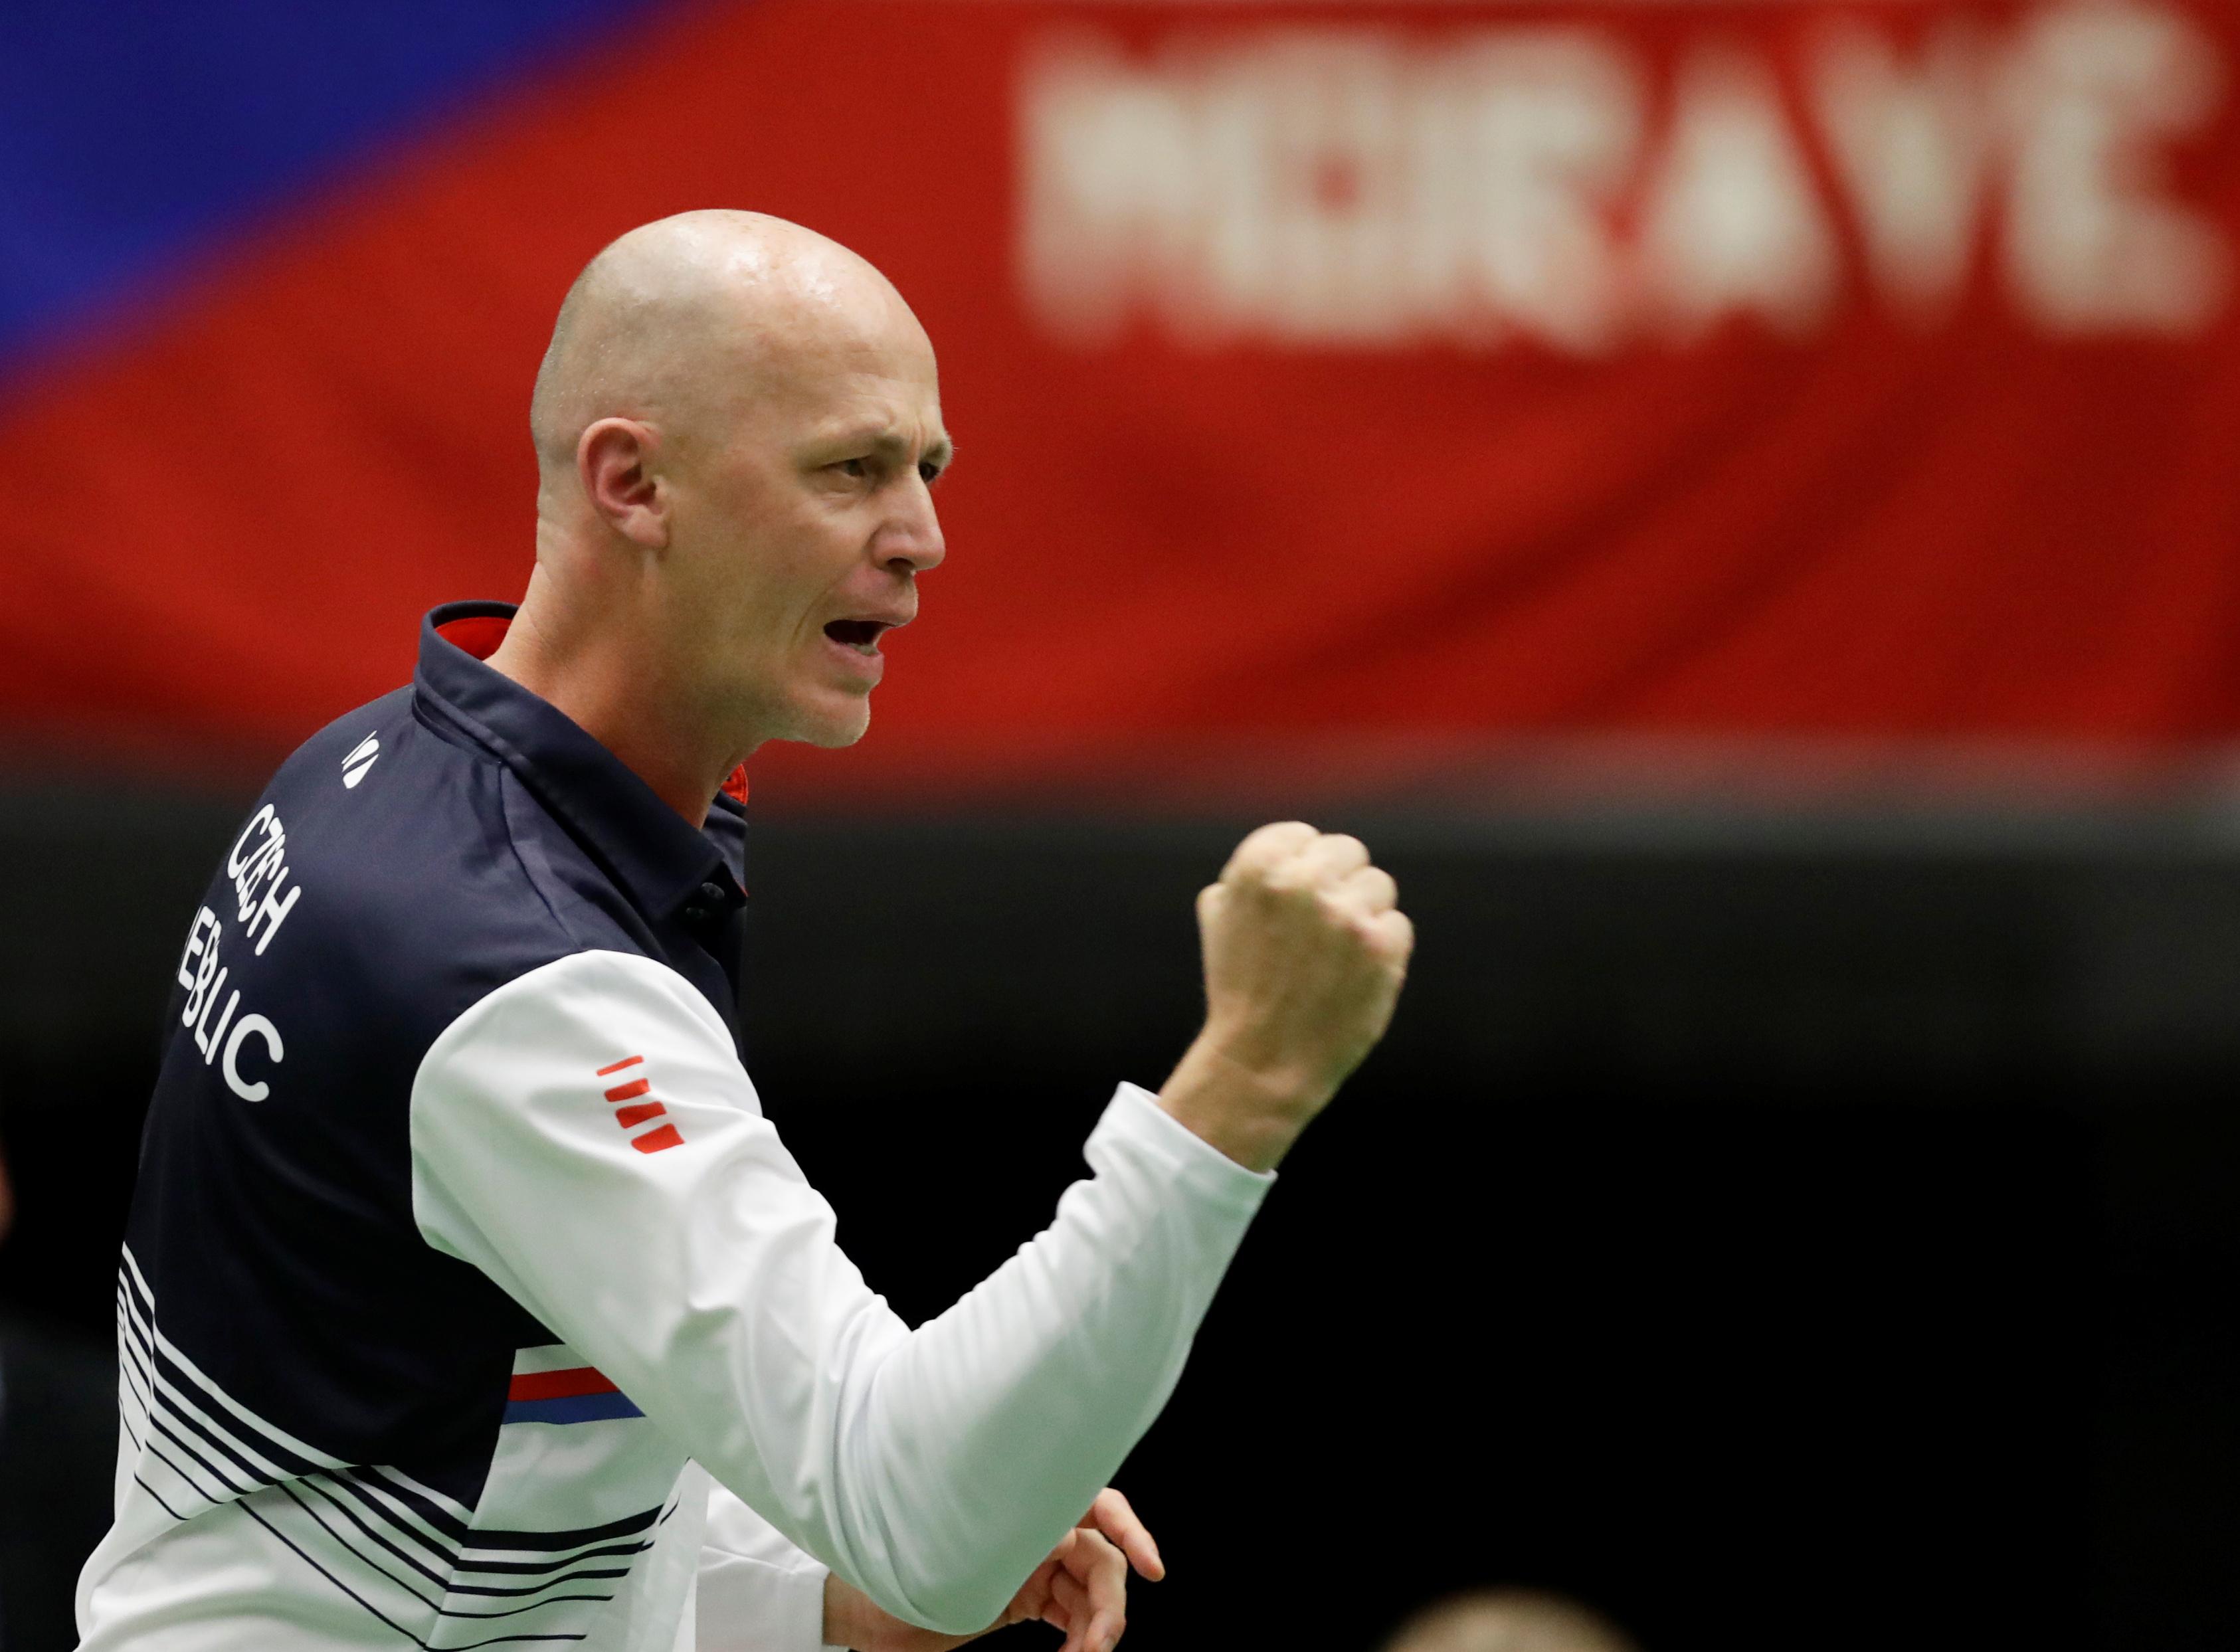 Tennis: Czech Republic handed 2020 Fed Cup wildcard